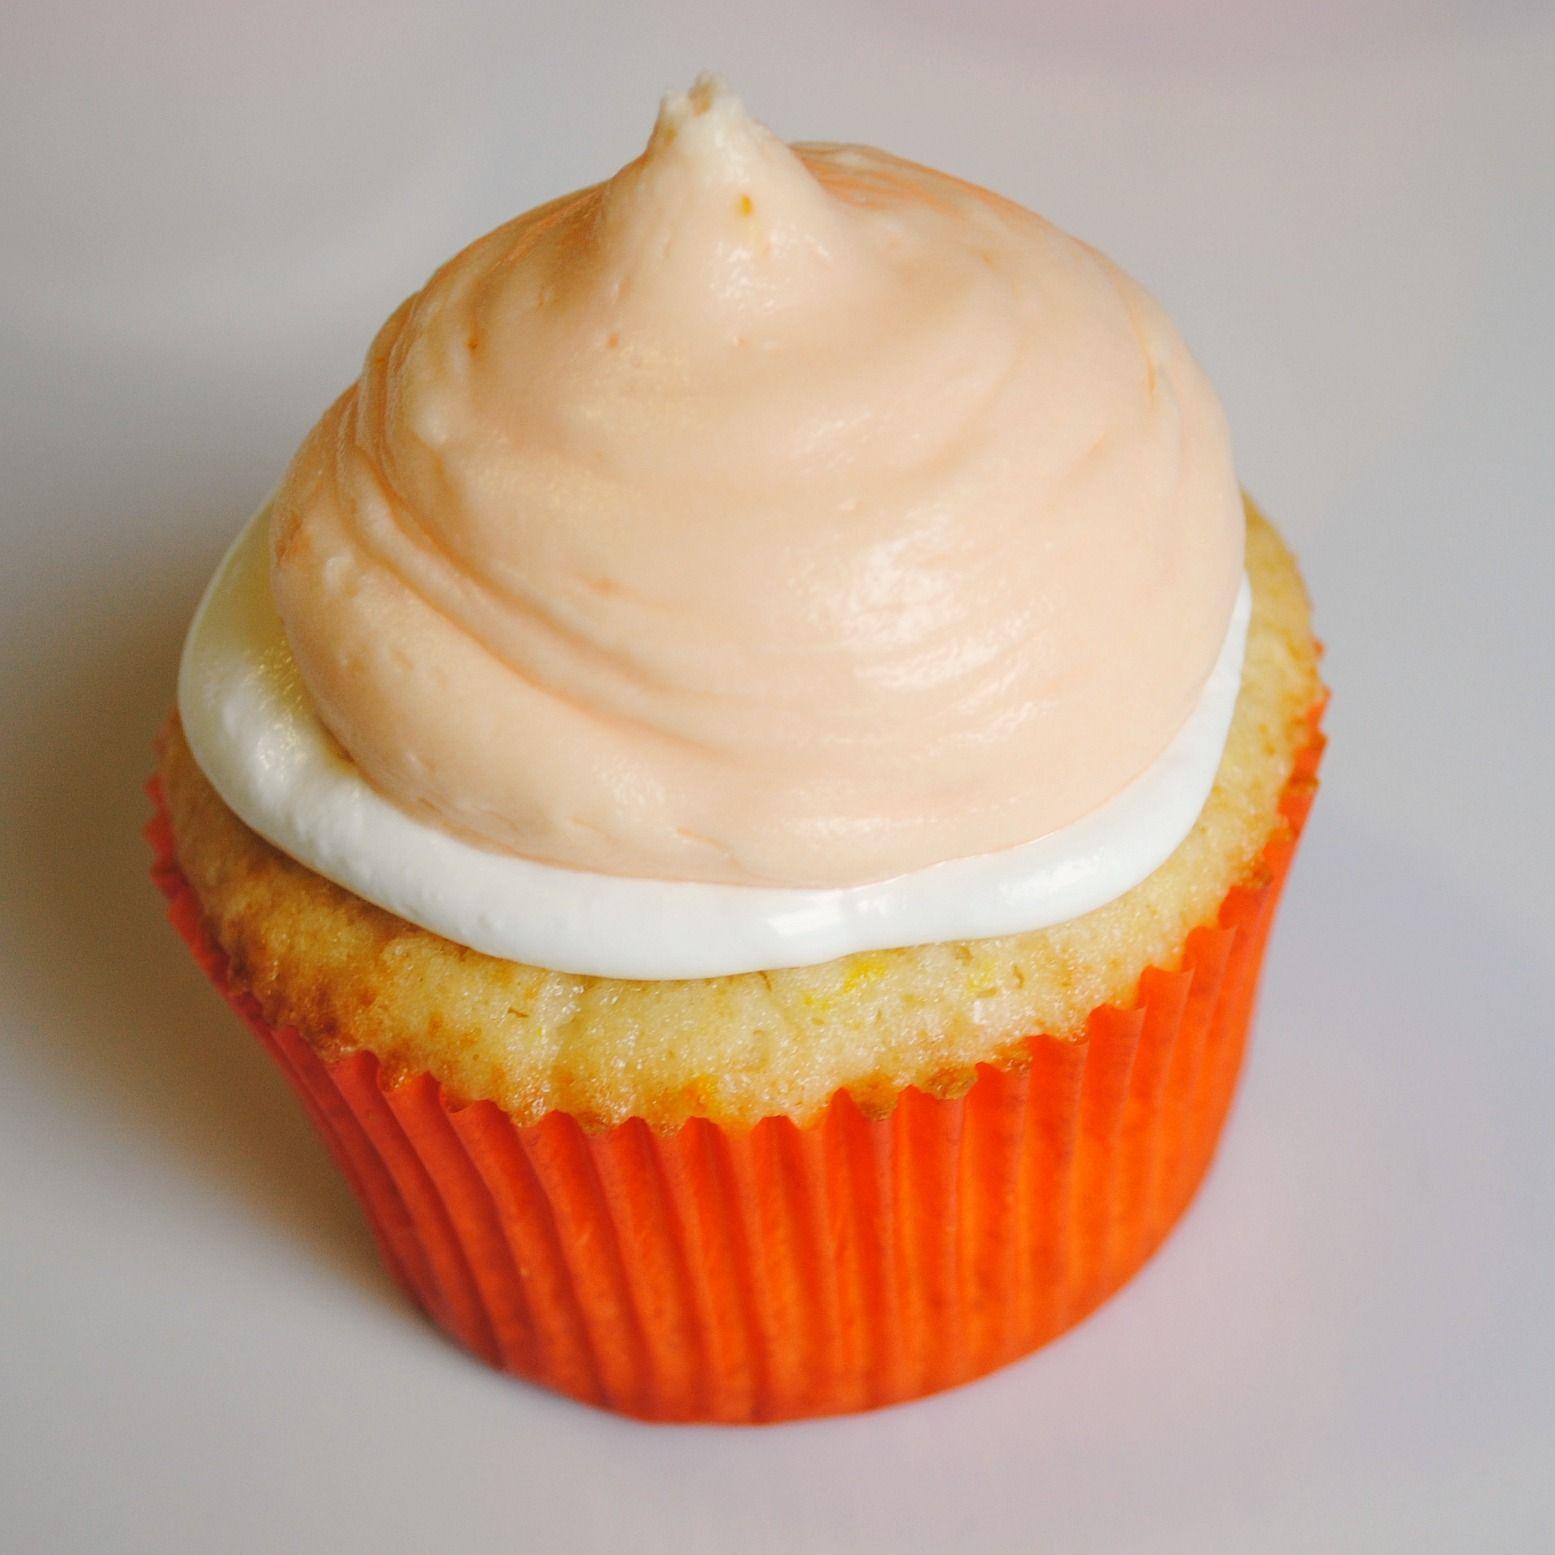 Orange creamcicle cupcake